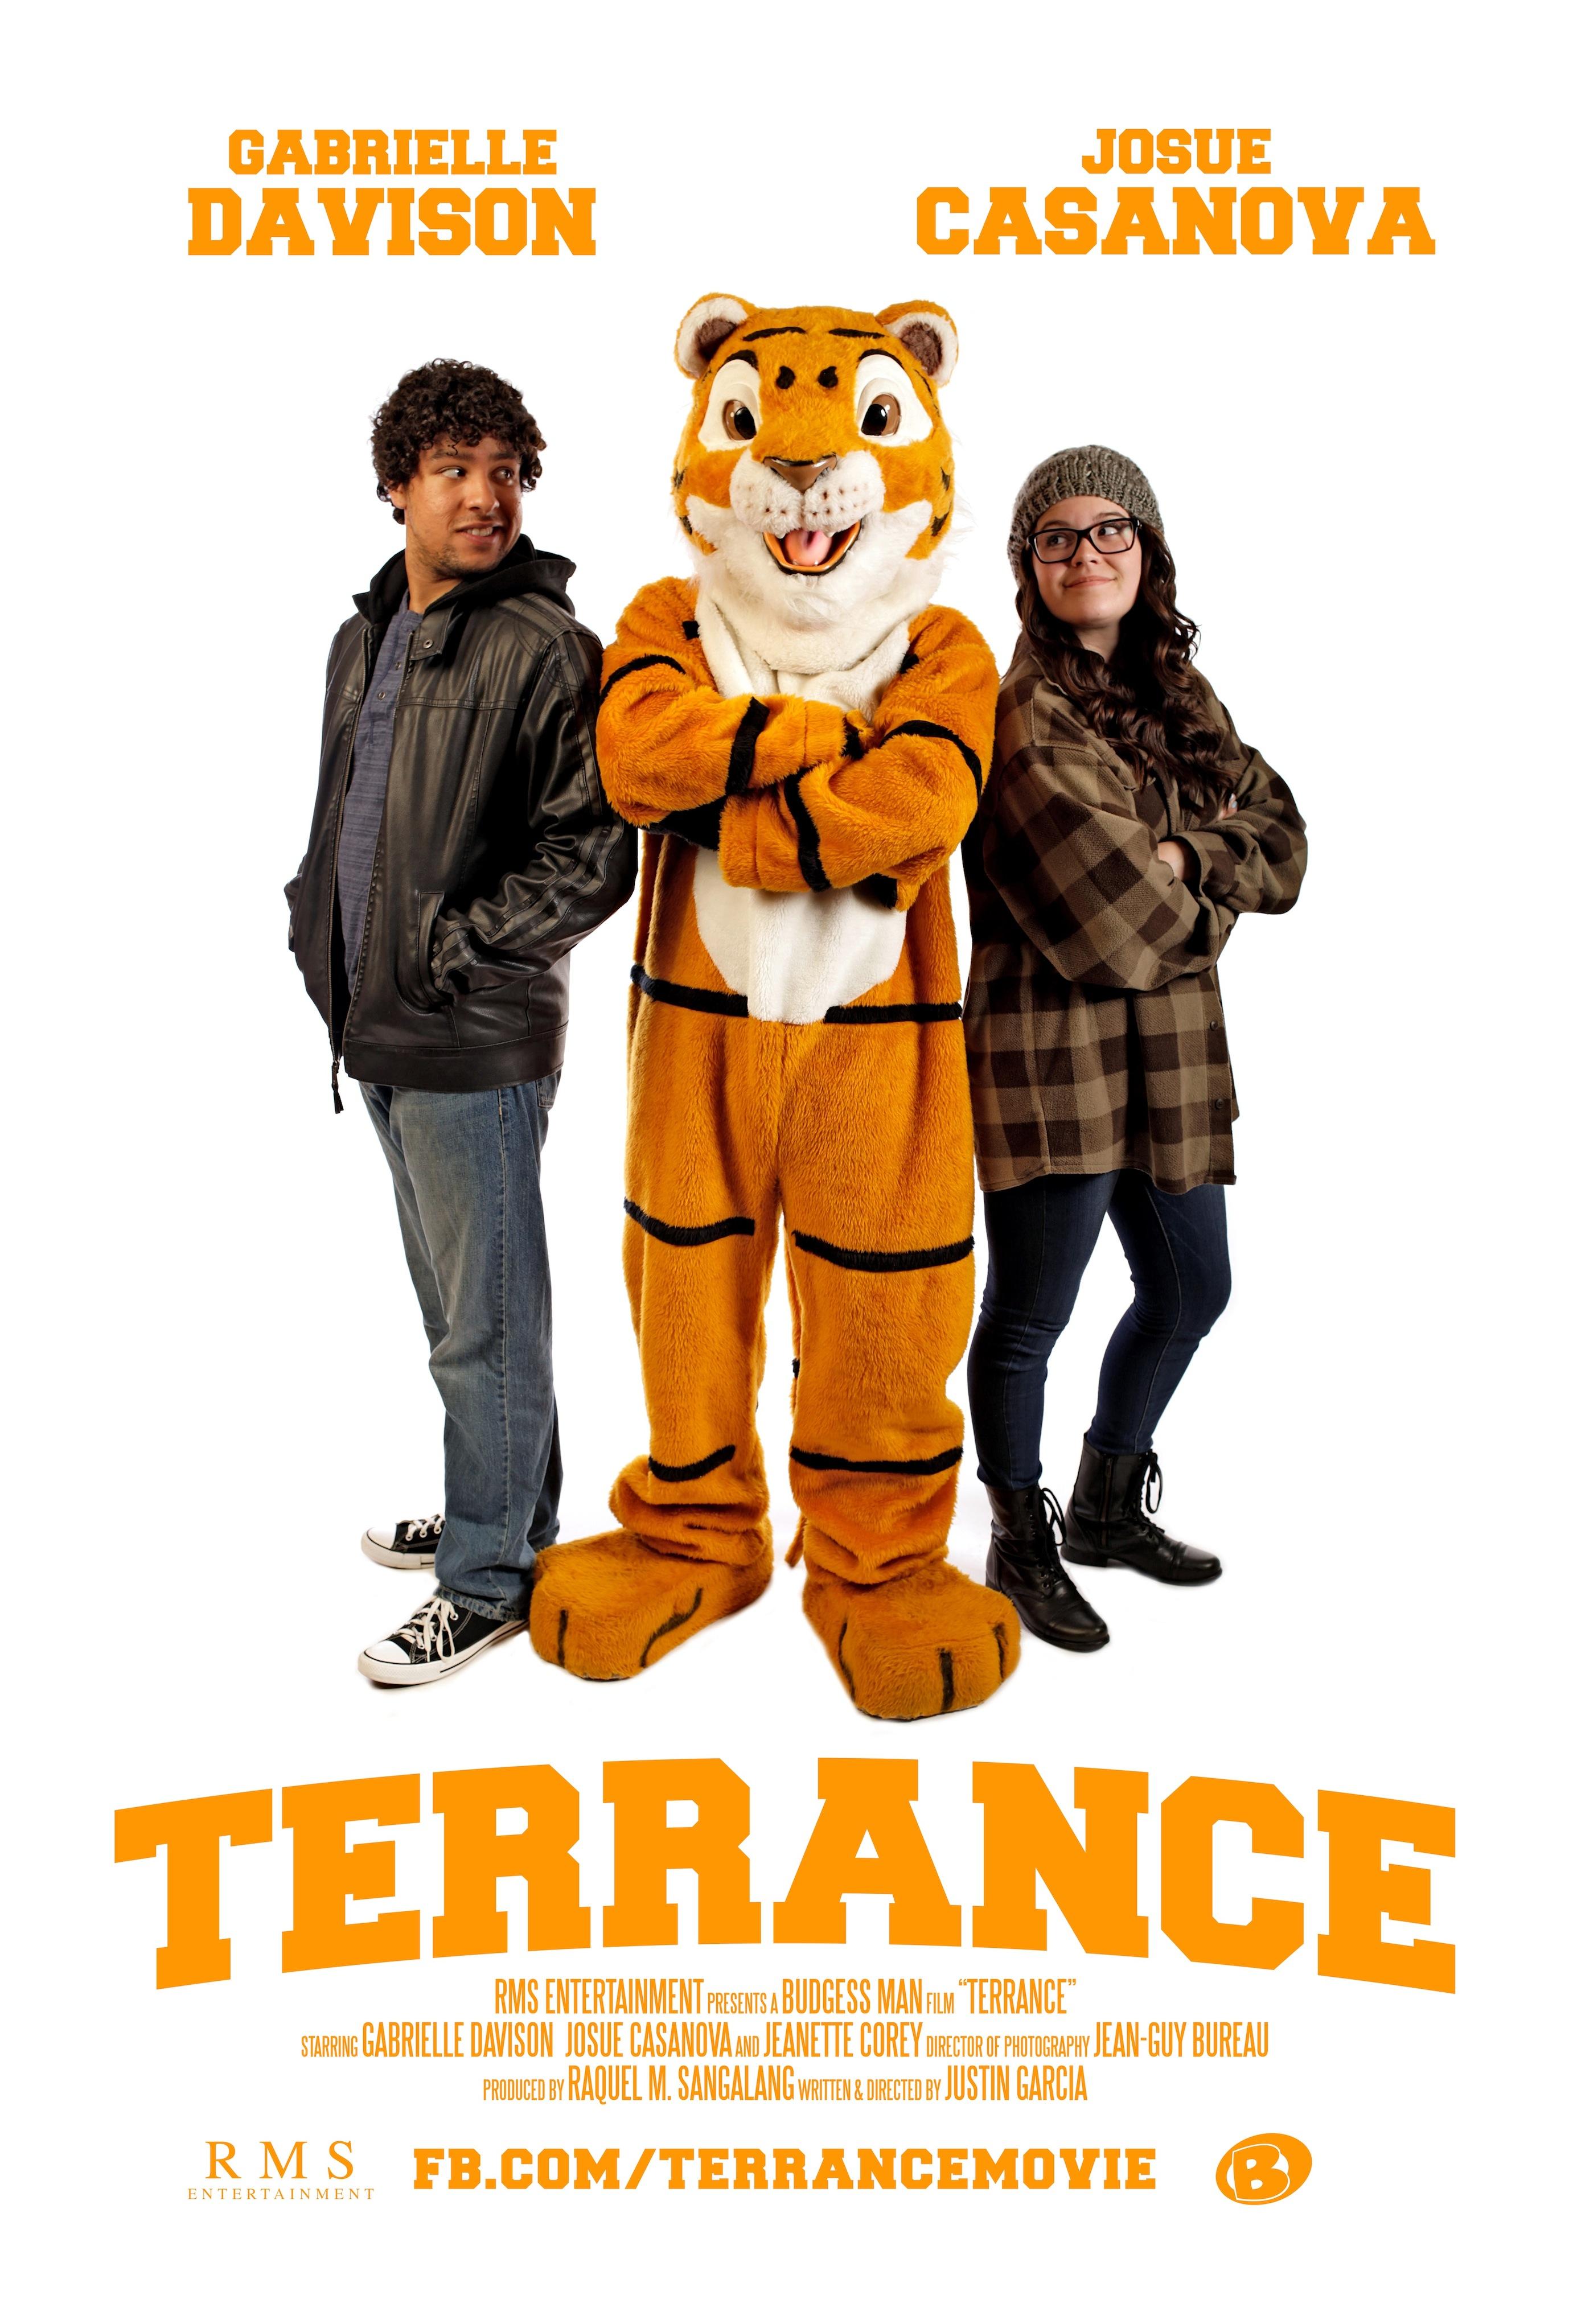 TERRANCE poster